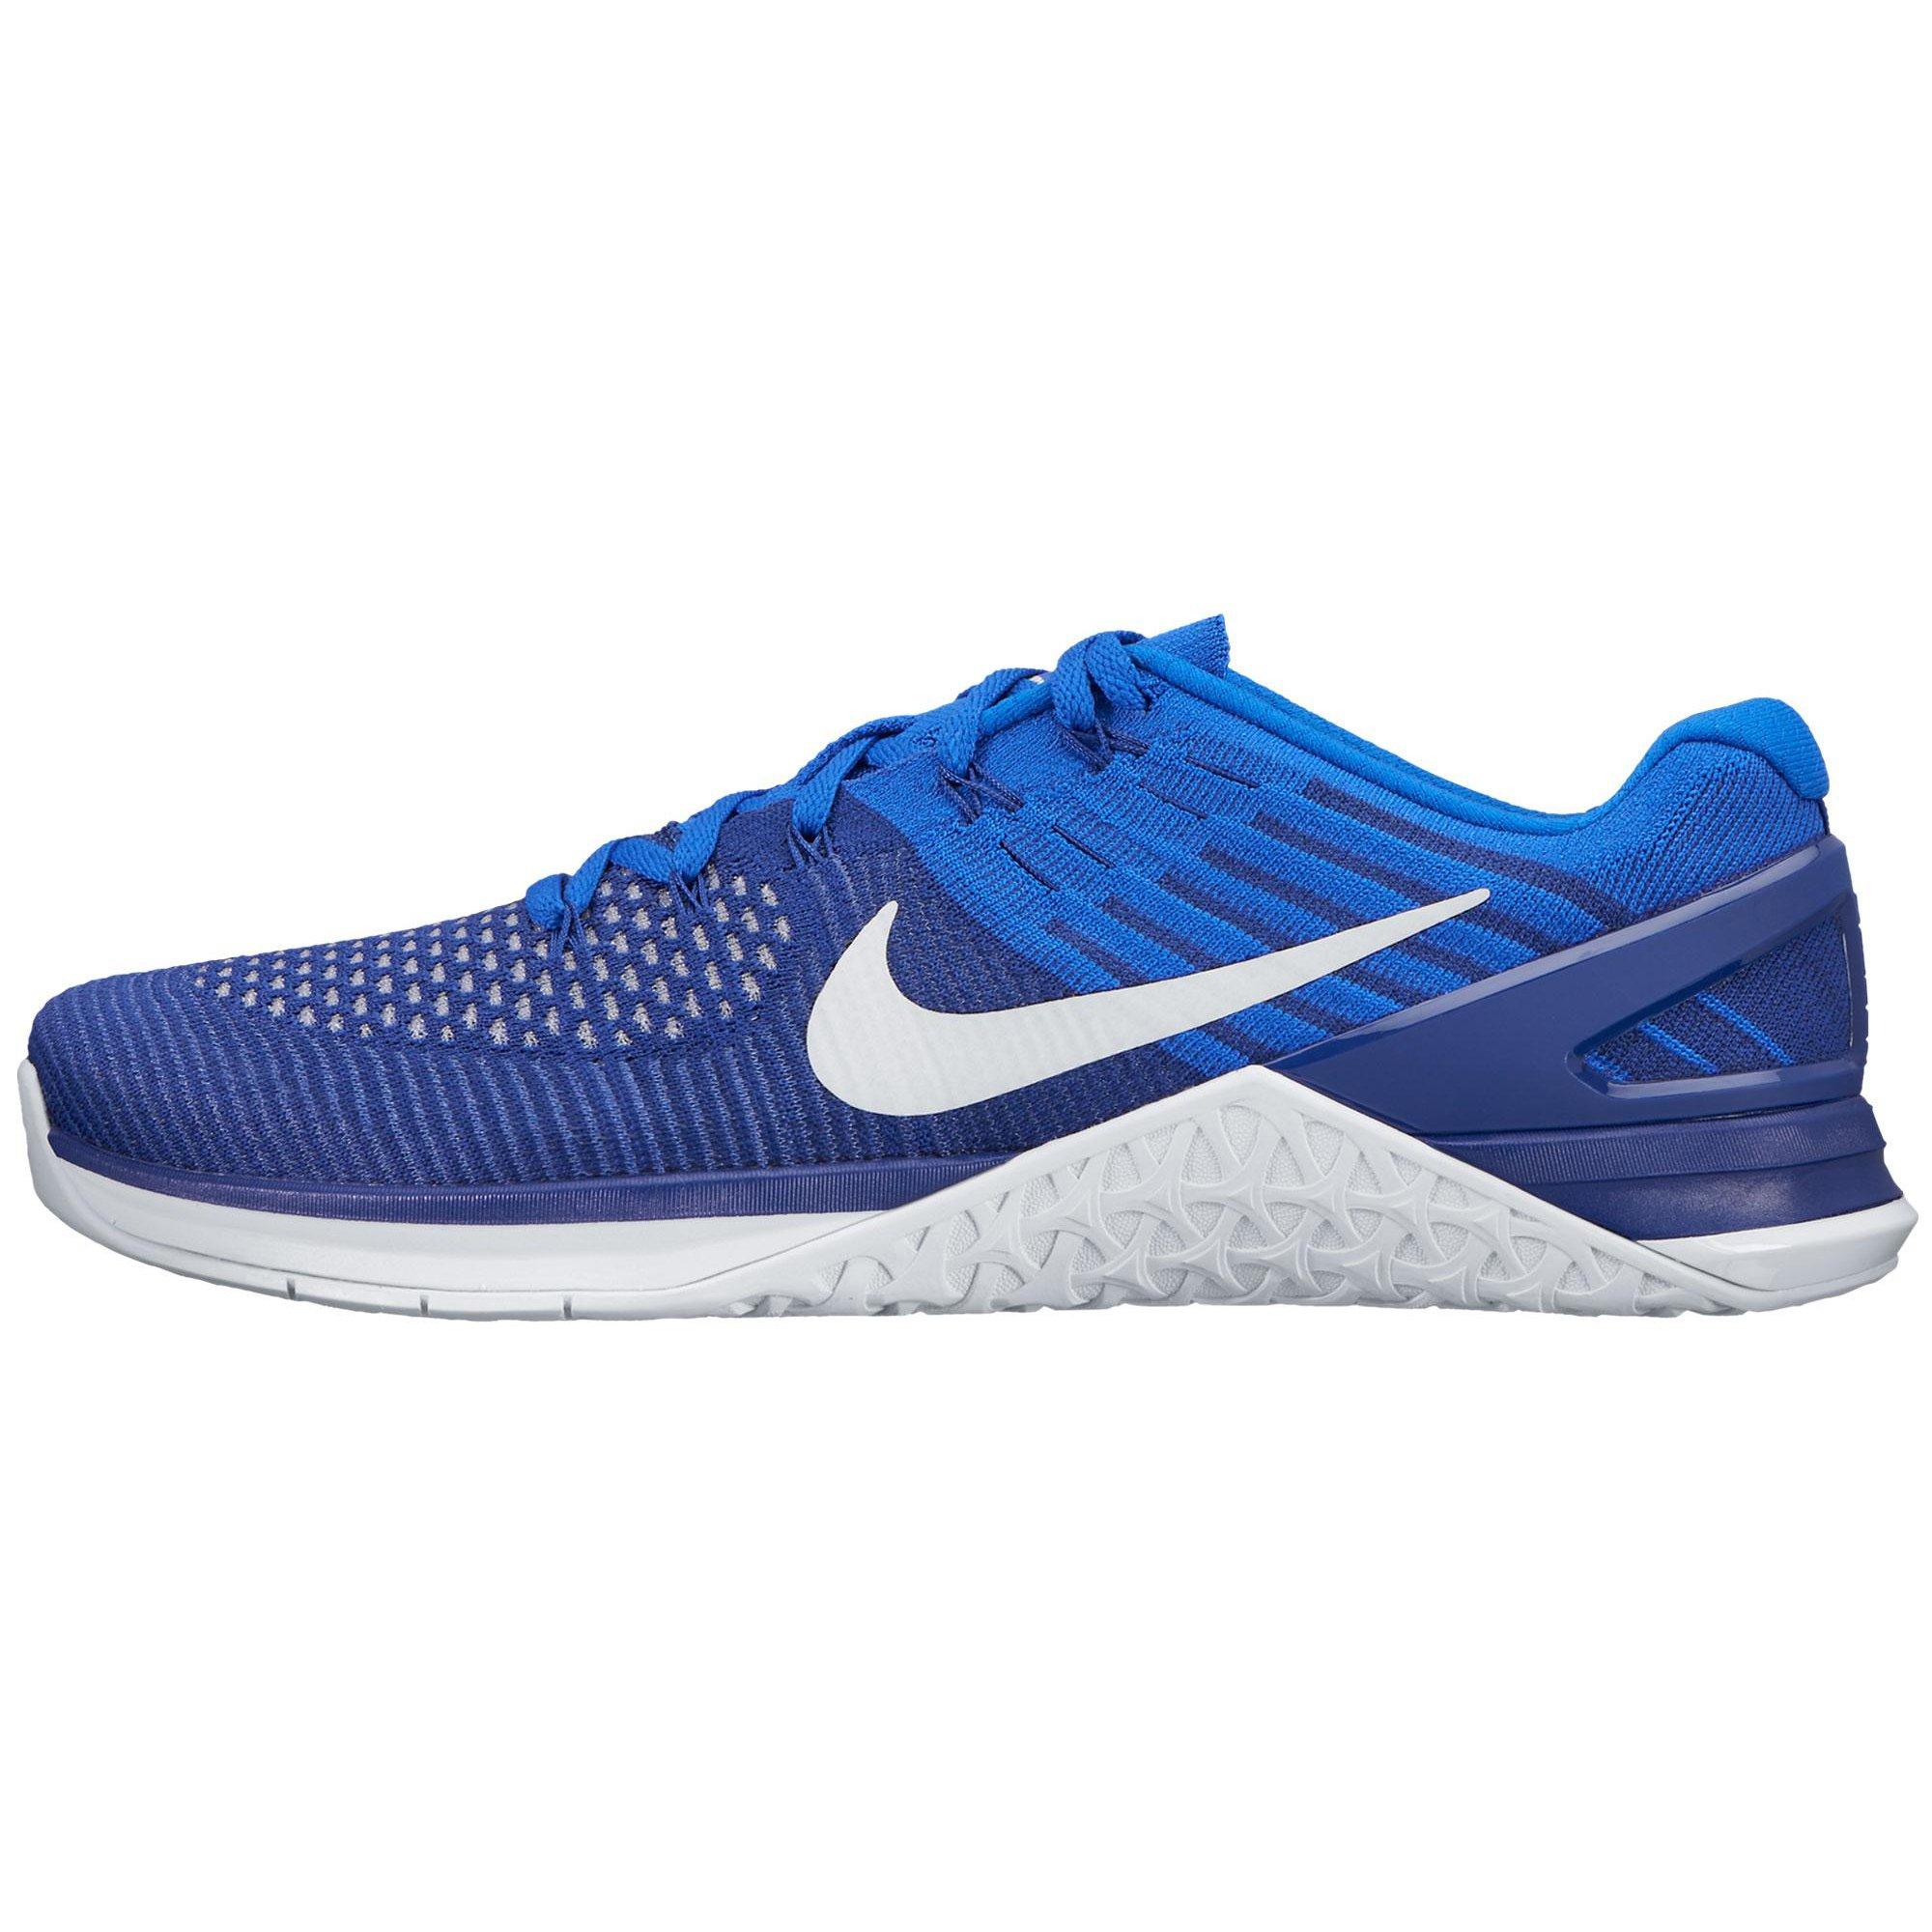 Nike Men's Metcon DSX Flyknit Training Shoe Deep Royal Blue/White-Racer Blue 12 D (M) US